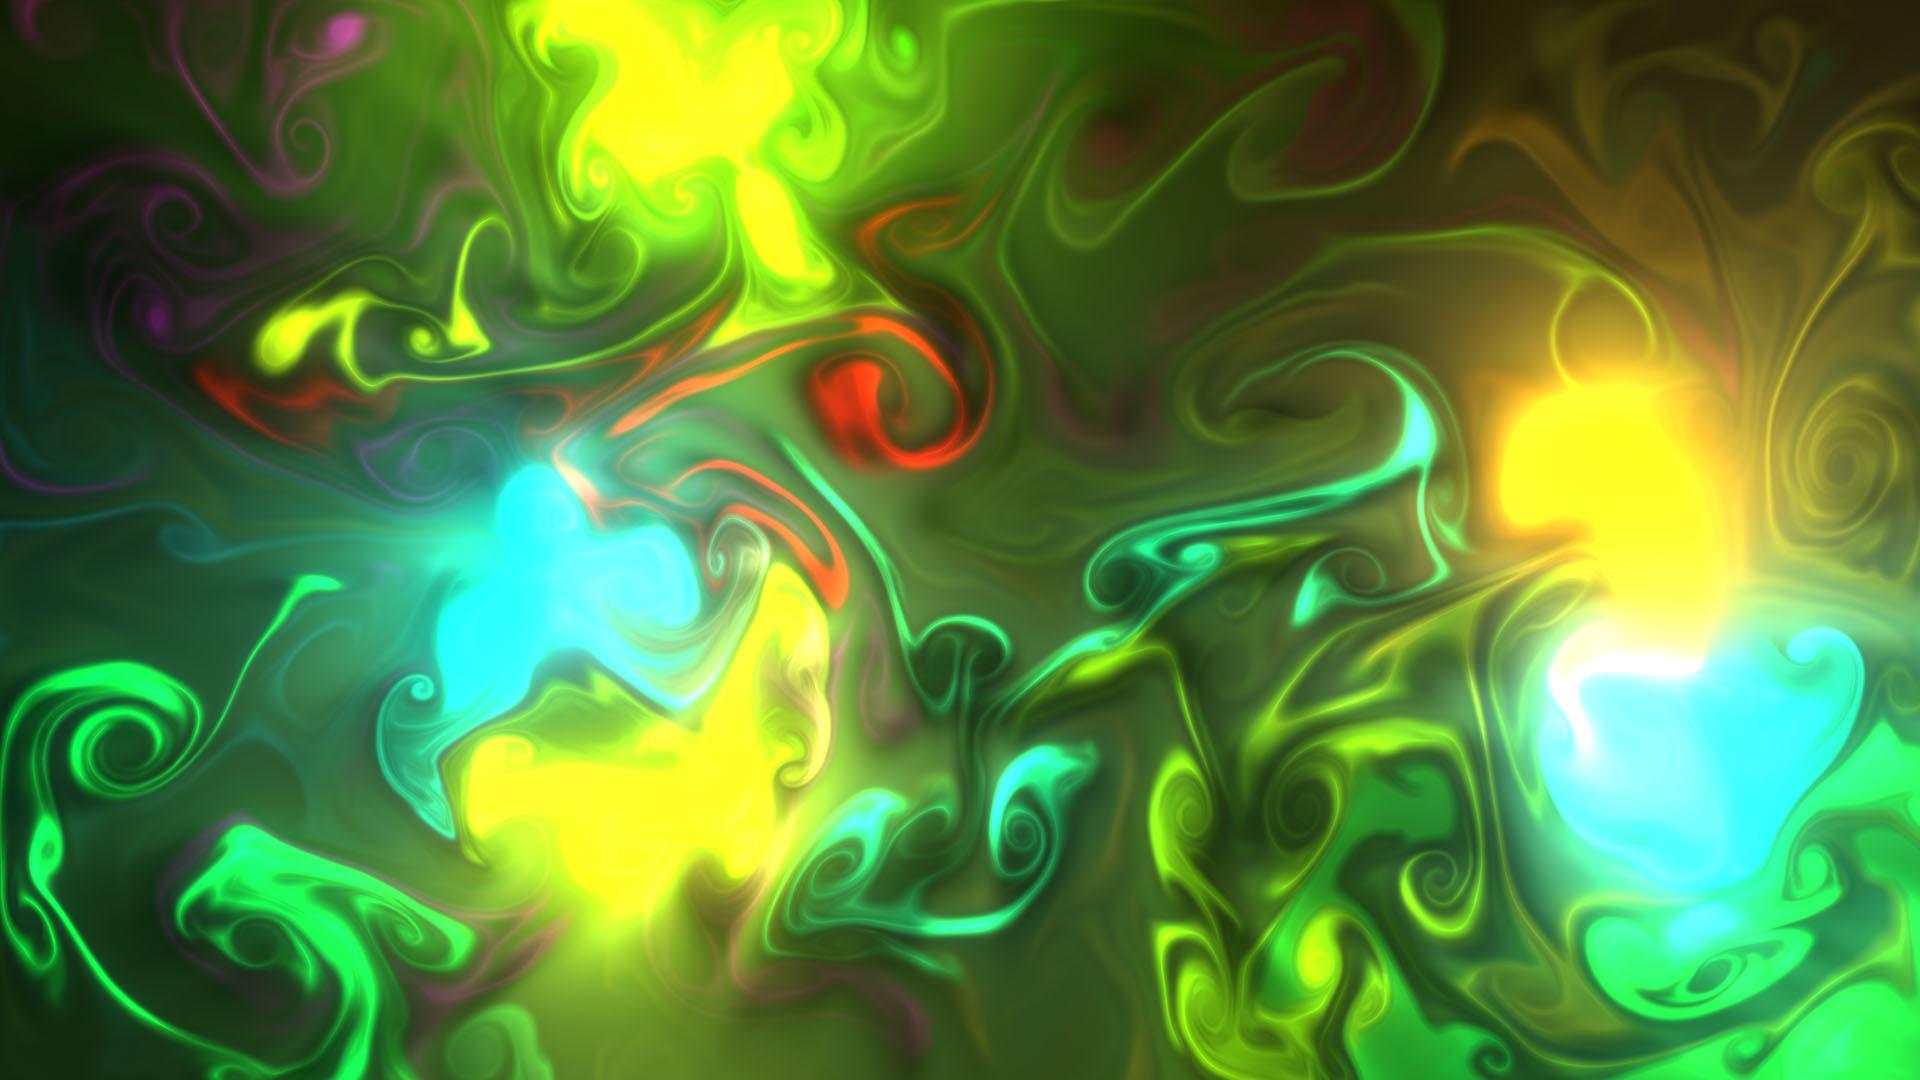 Fluid Engine PC Live Wallpaper on Steam